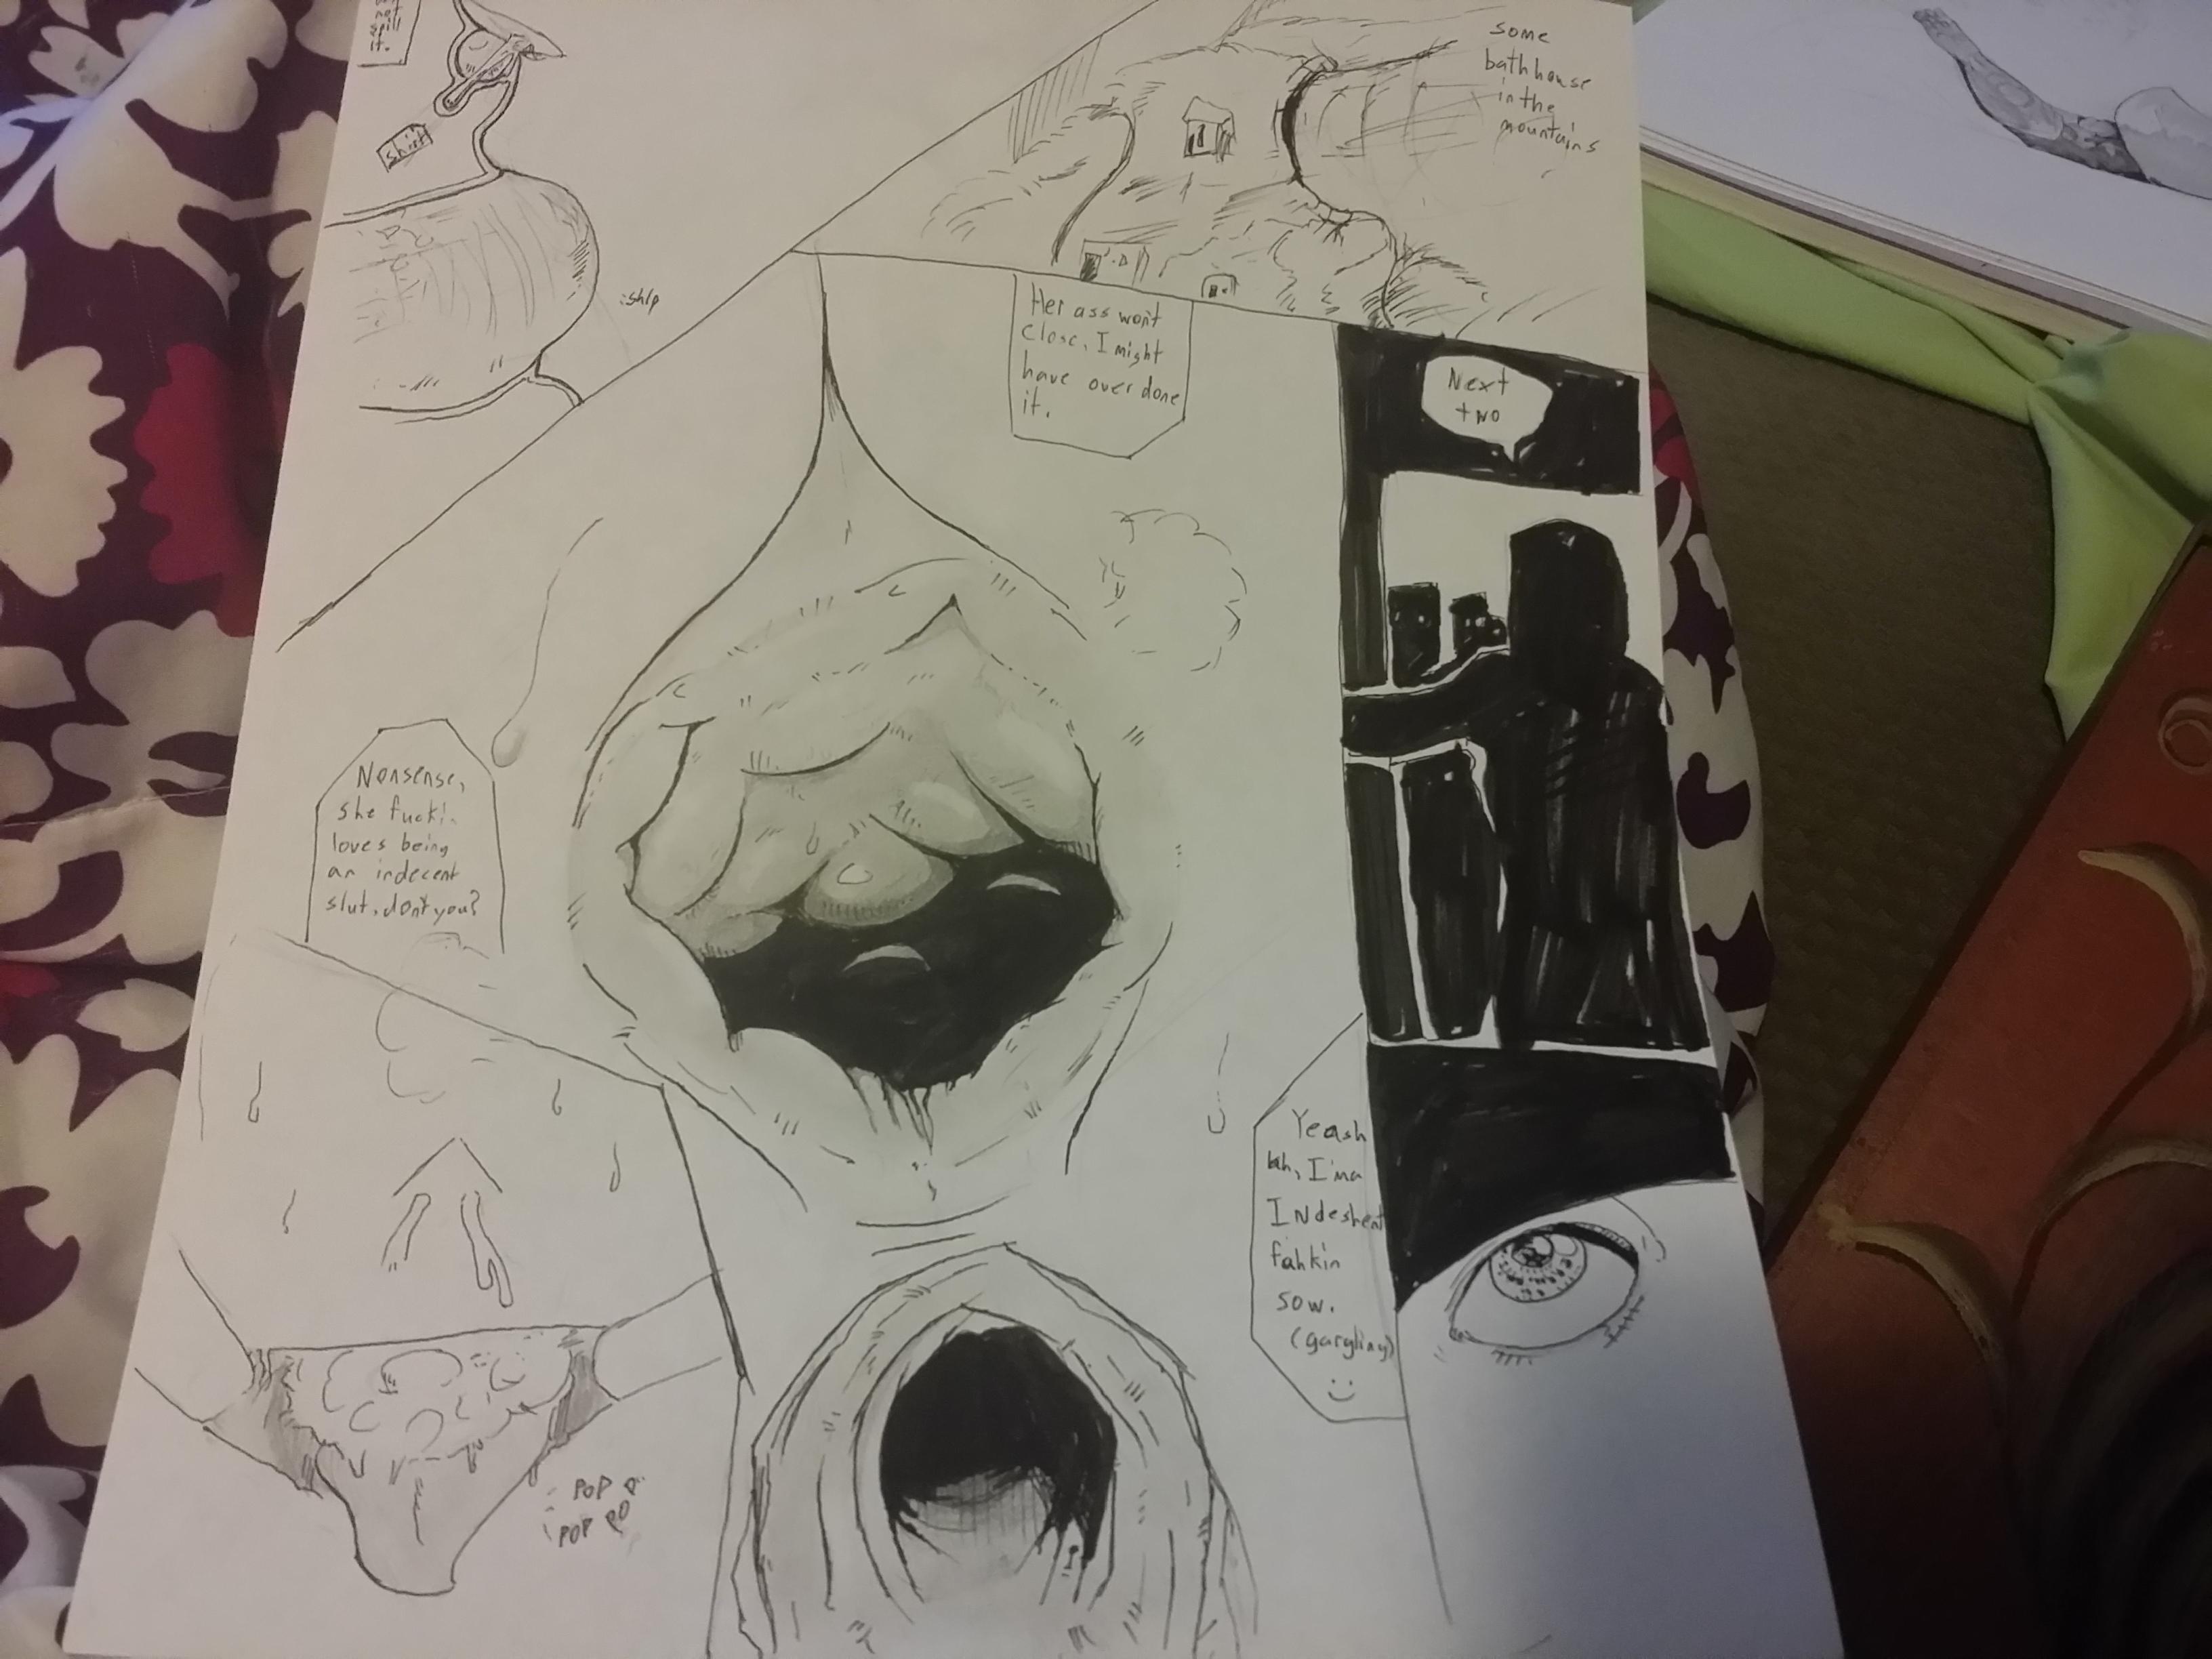 my atempt at a comic p